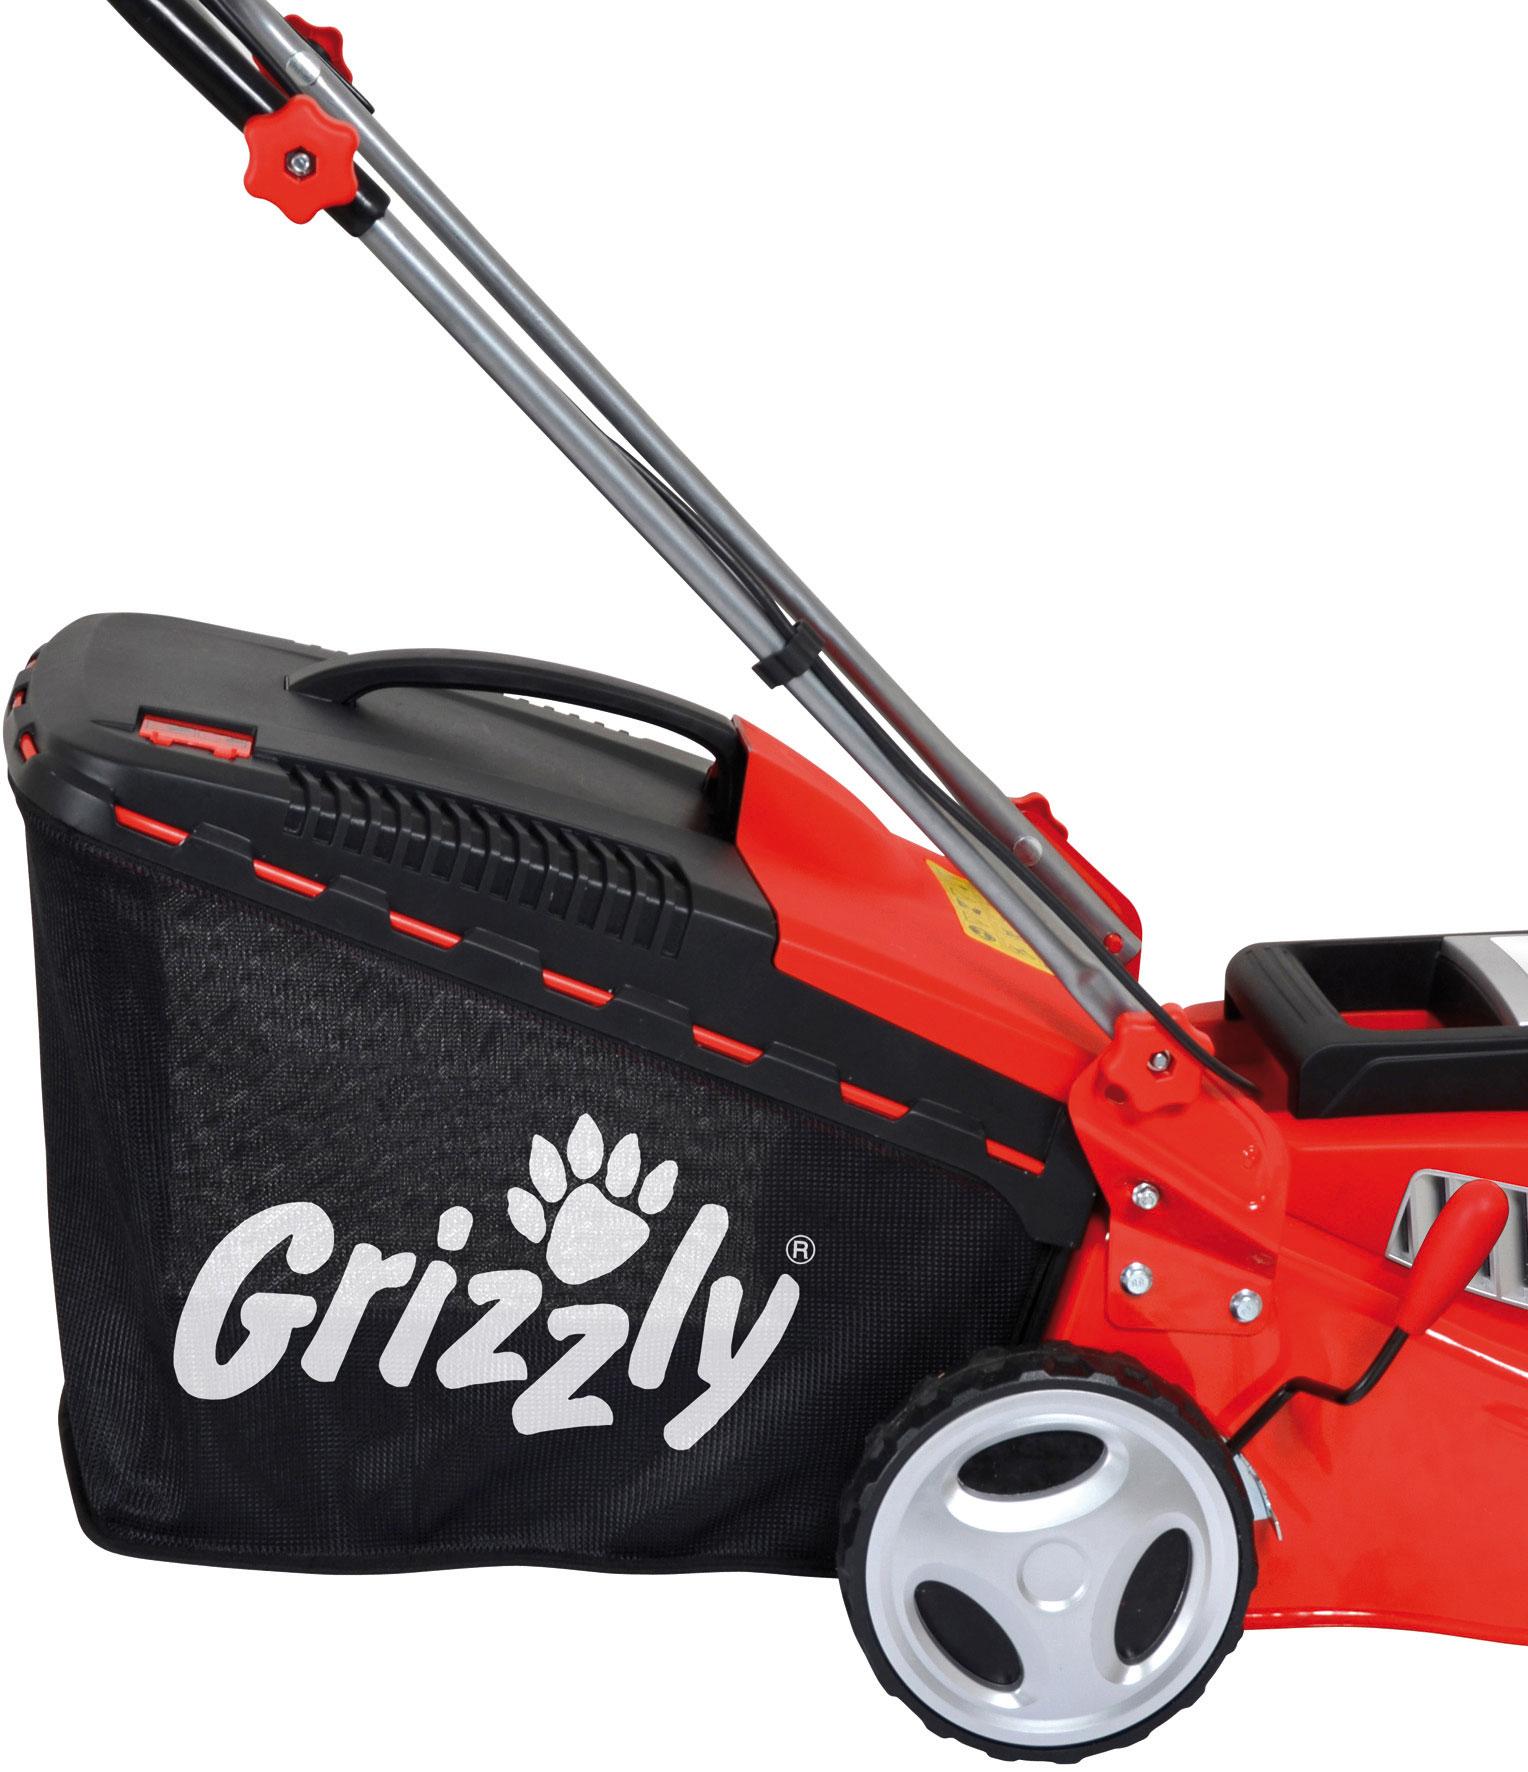 Elektro Rasenmäher Grizzly ERM 1846 GT 1800 Watt Bild 3